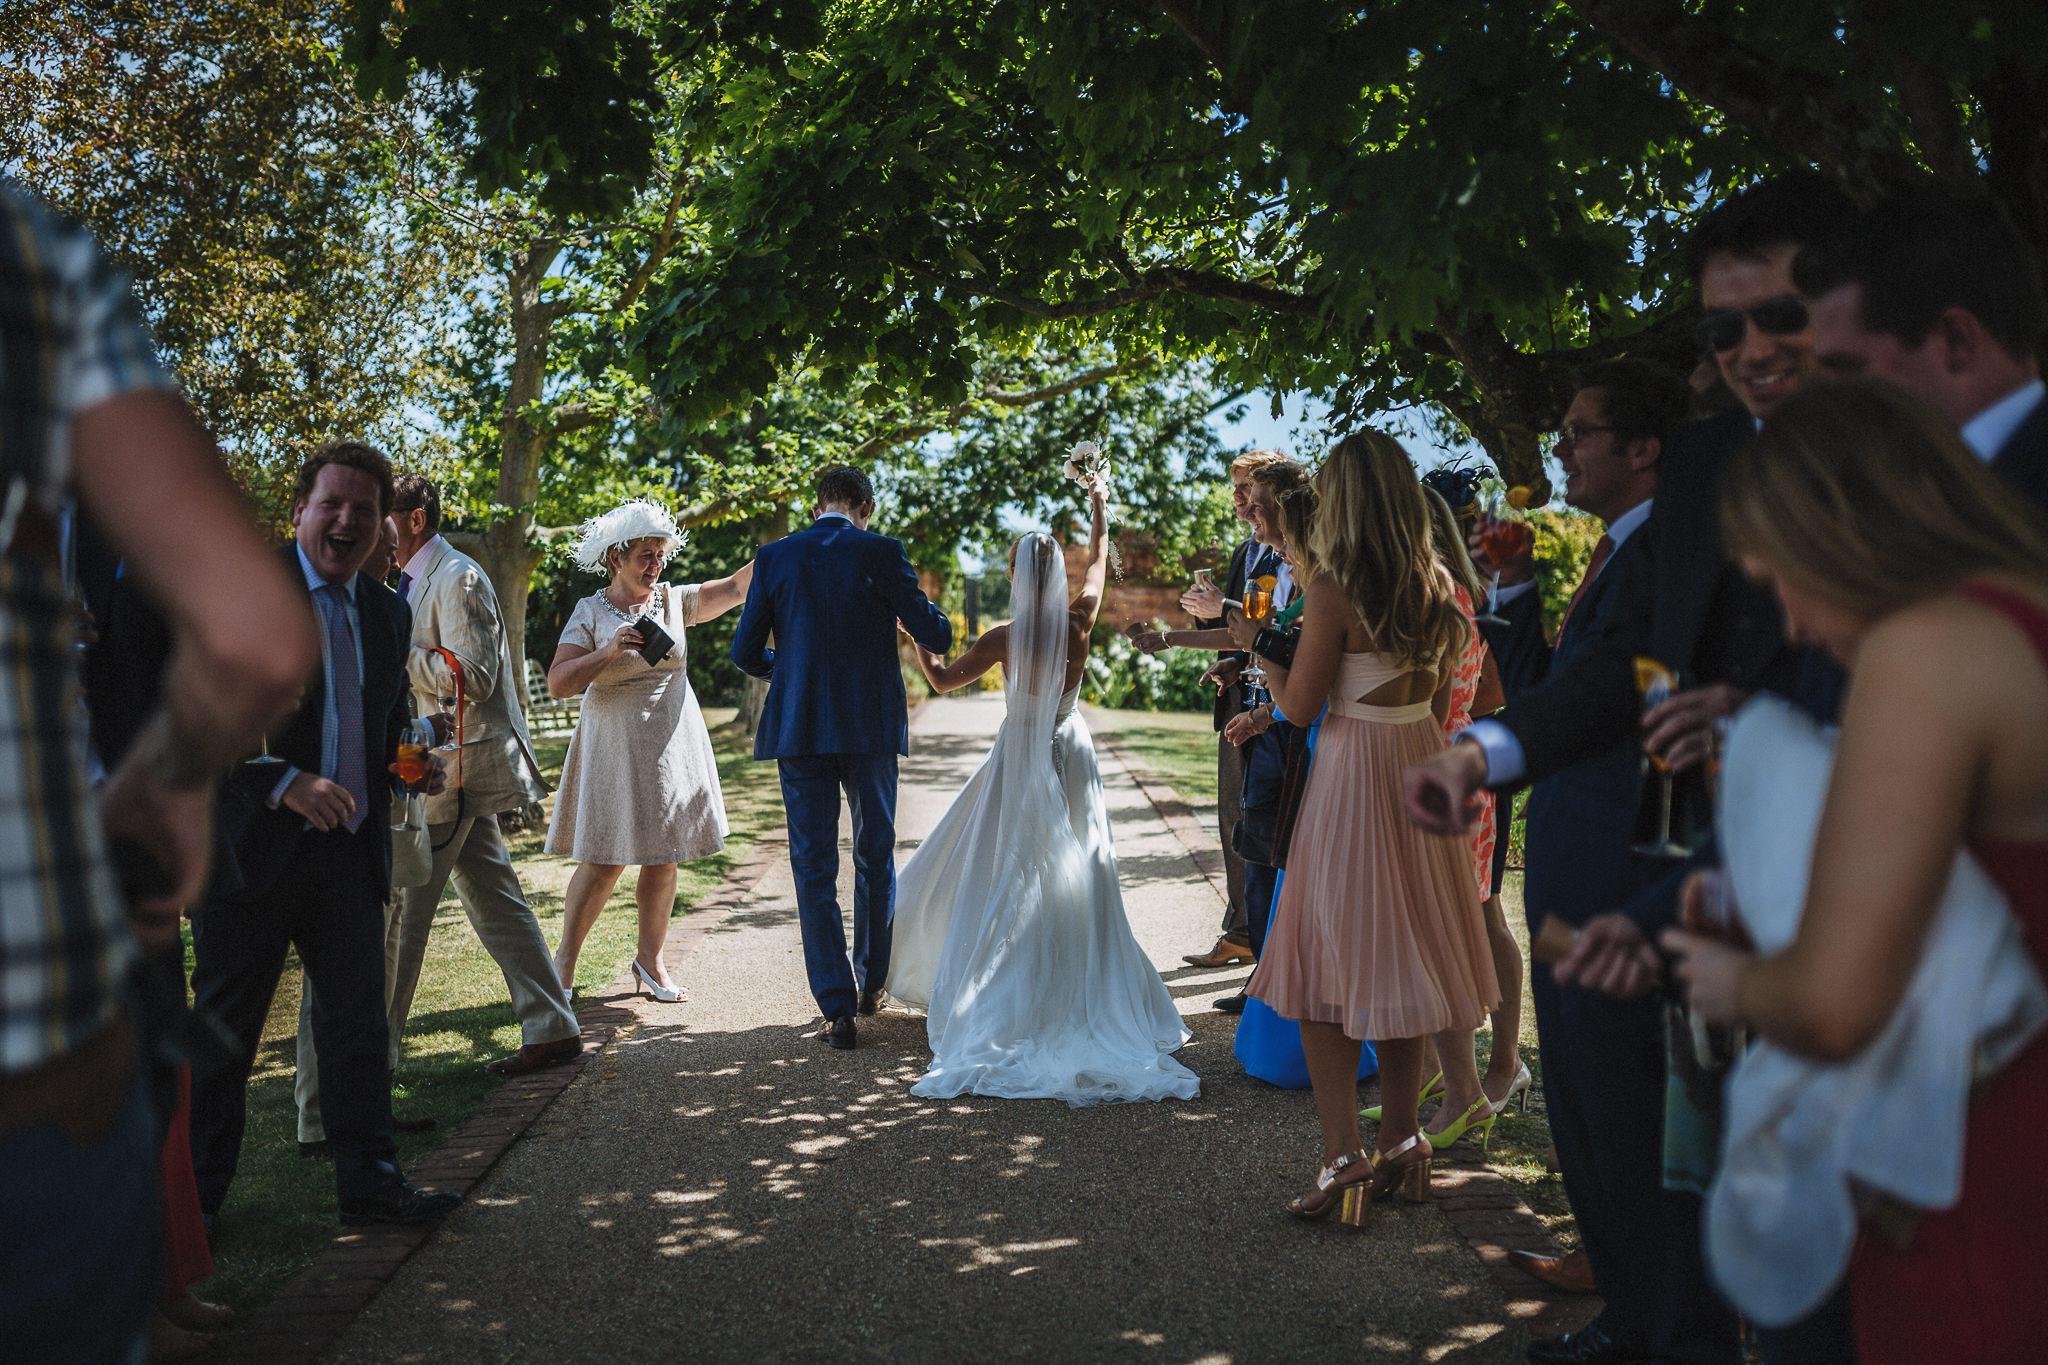 paul-marbrook-Gaynes-Park Wedding-Photographer-90065